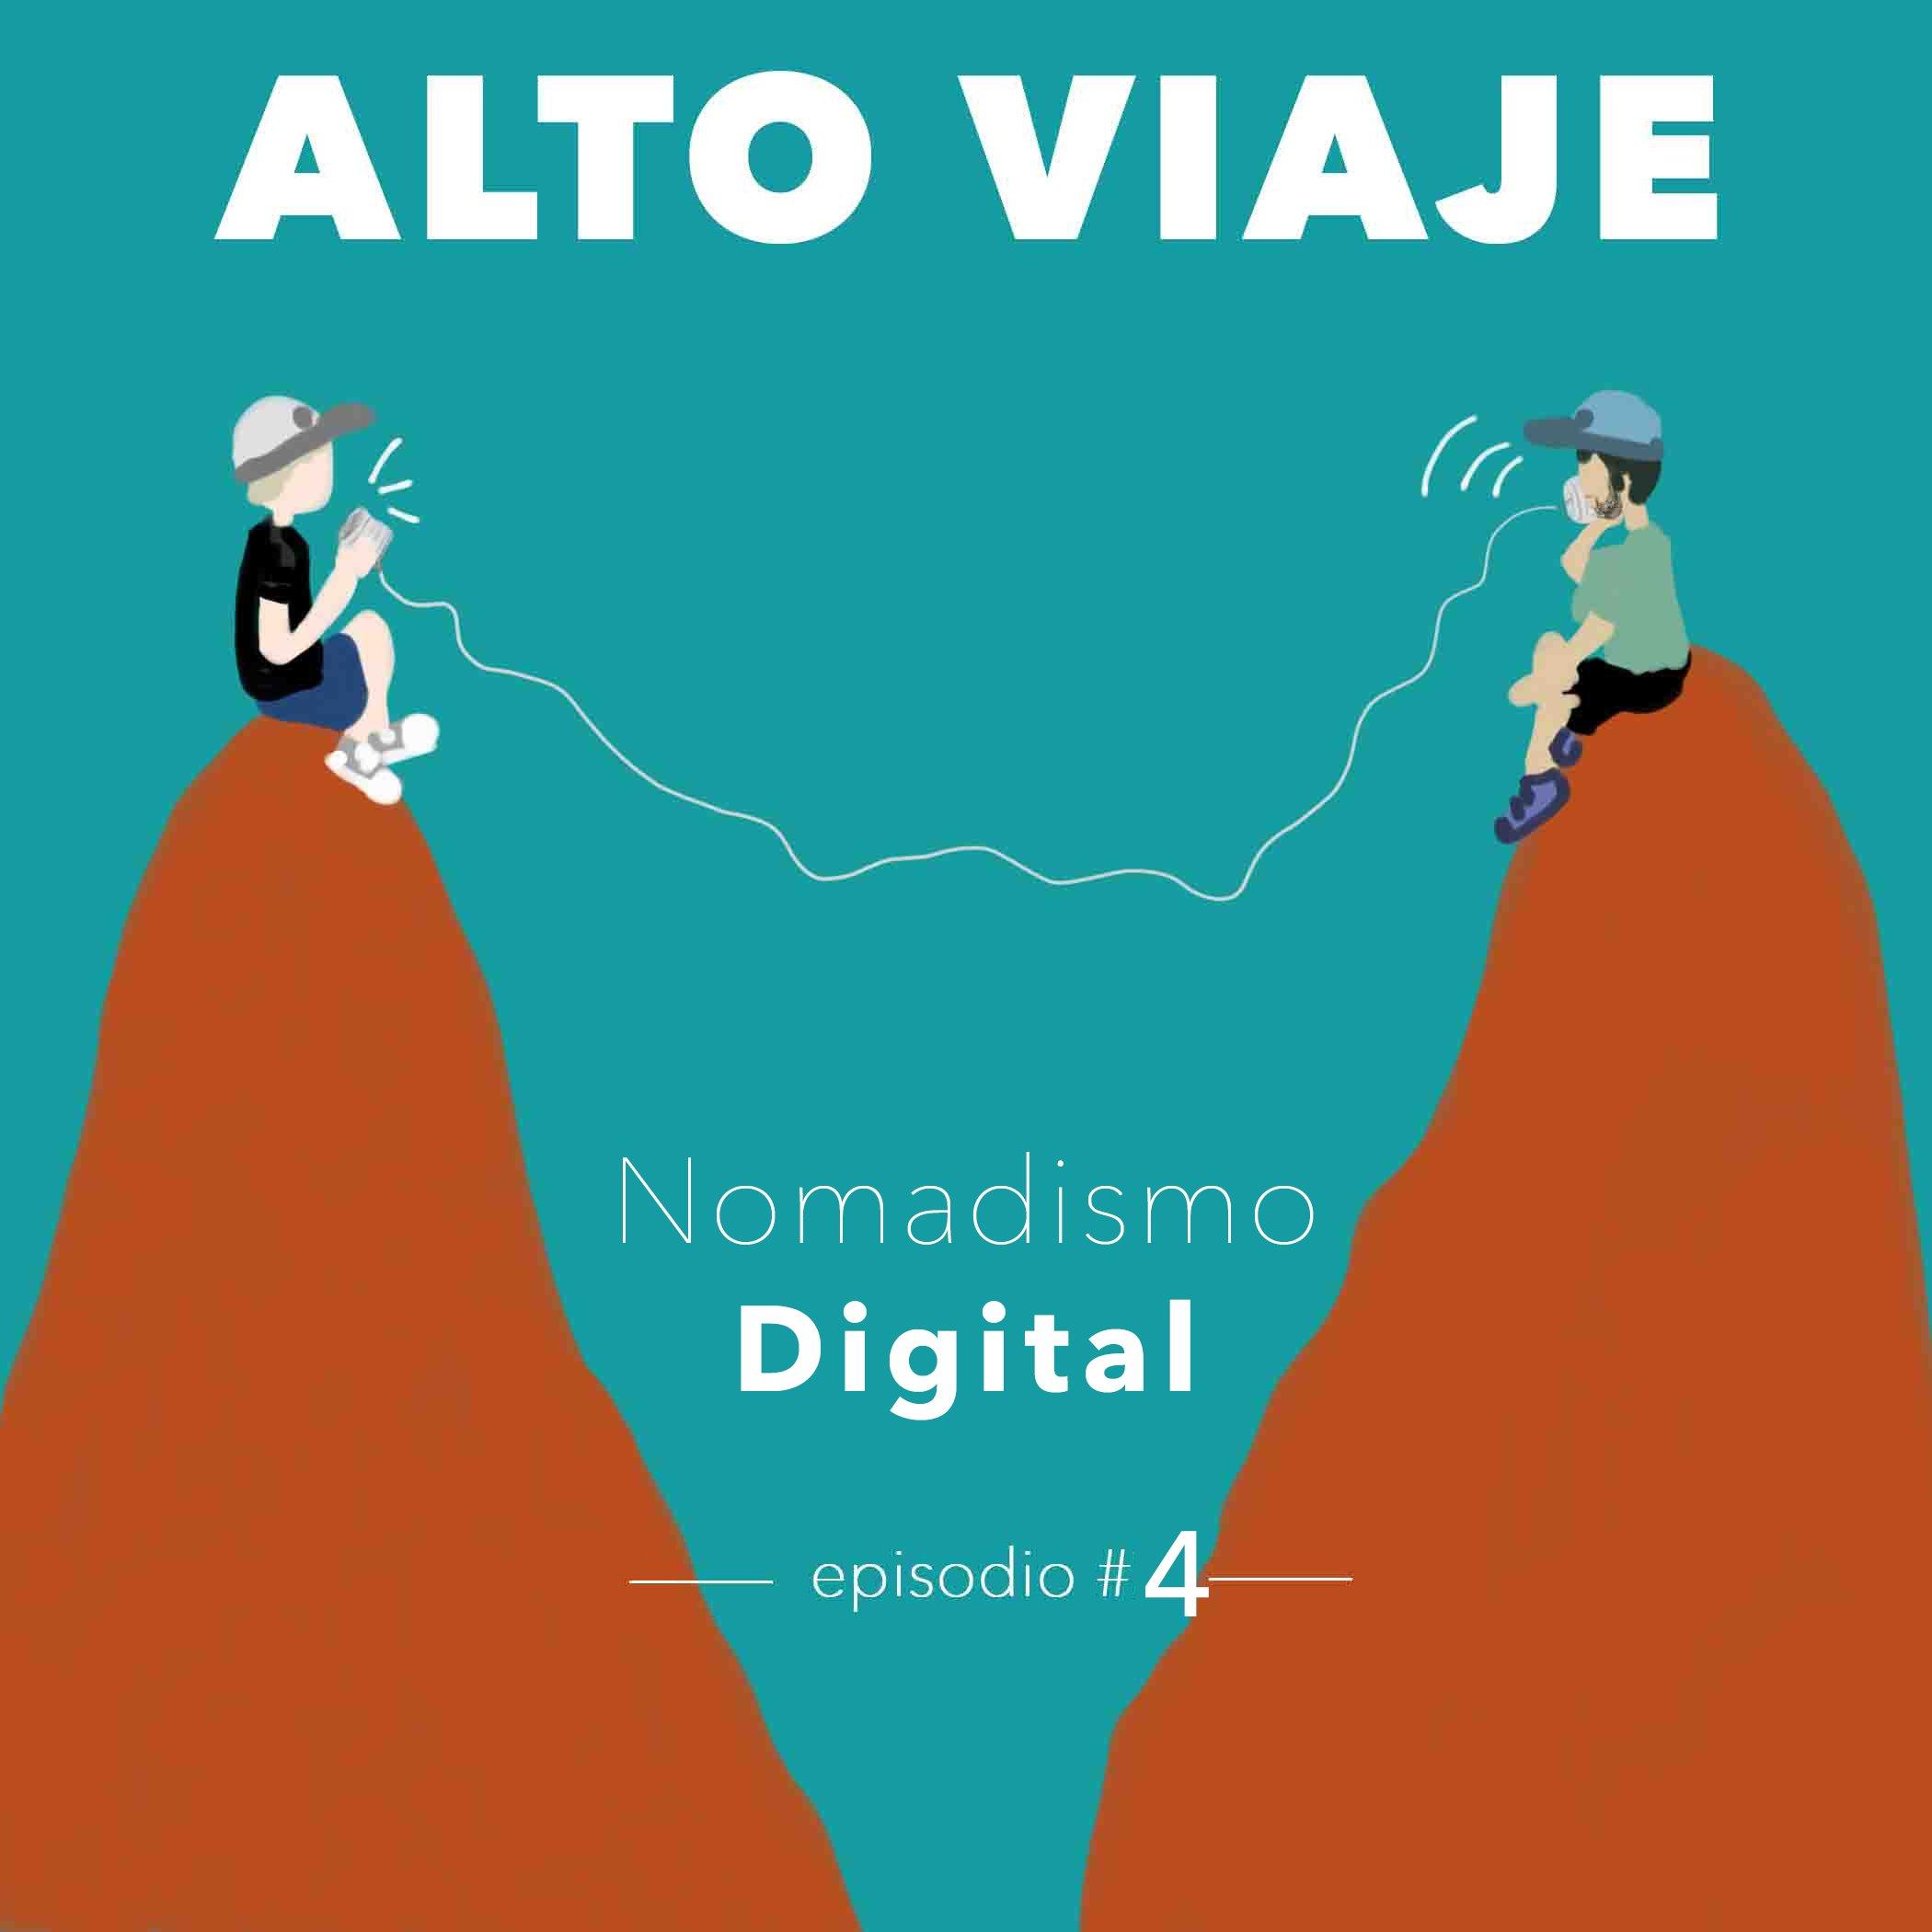 Episodio4 - Alto Viaje - Nomadismo Digital